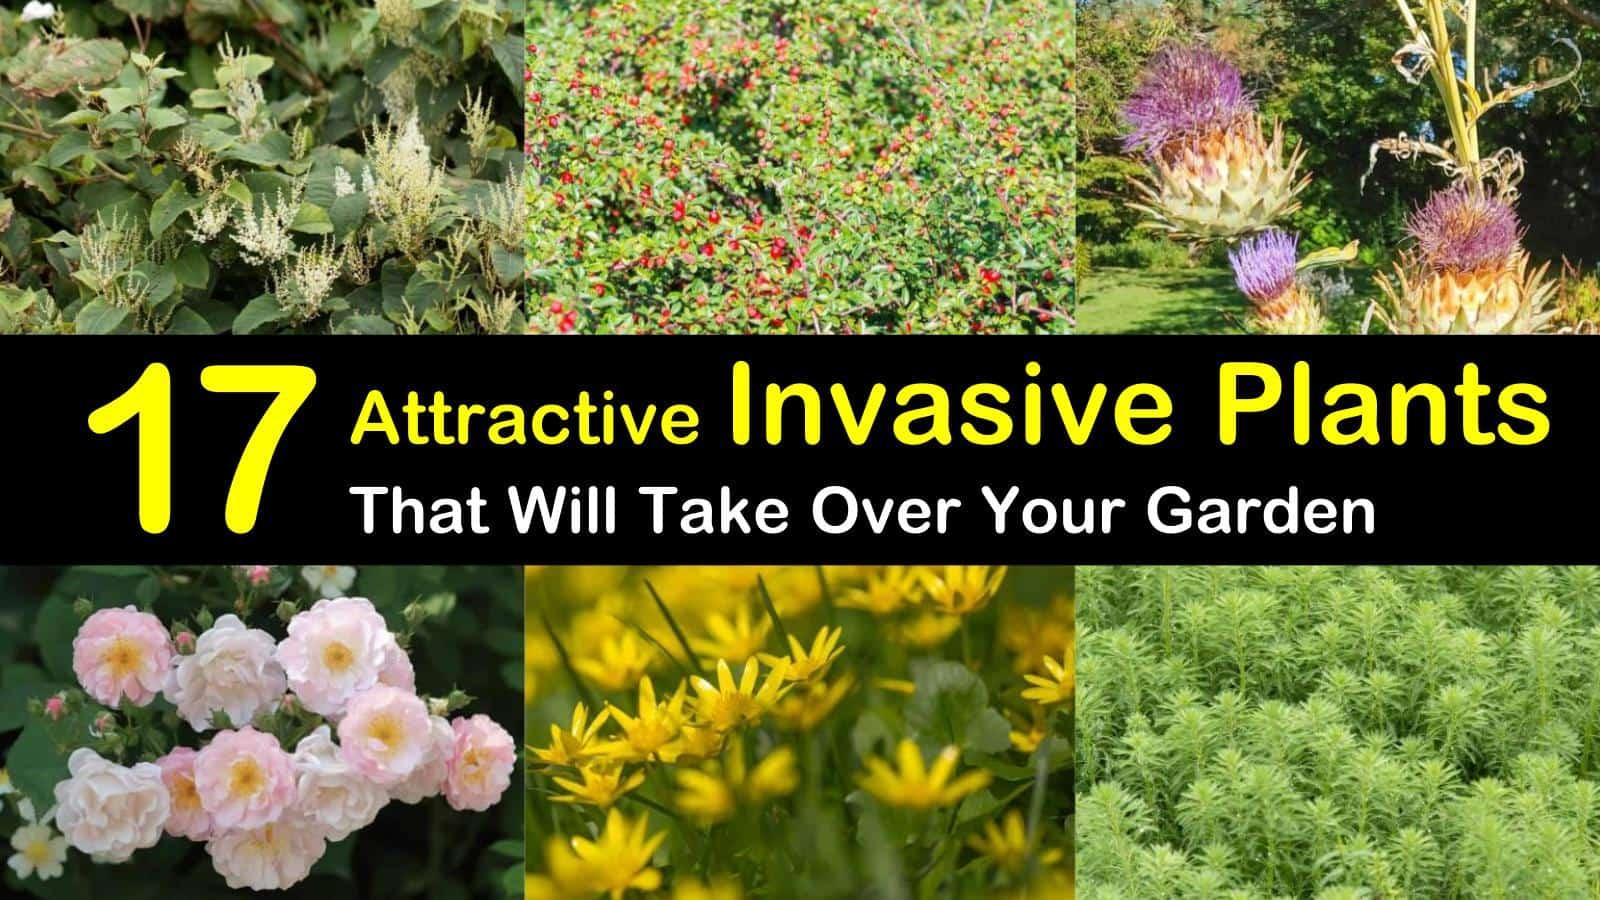 invasive plants titleimg1